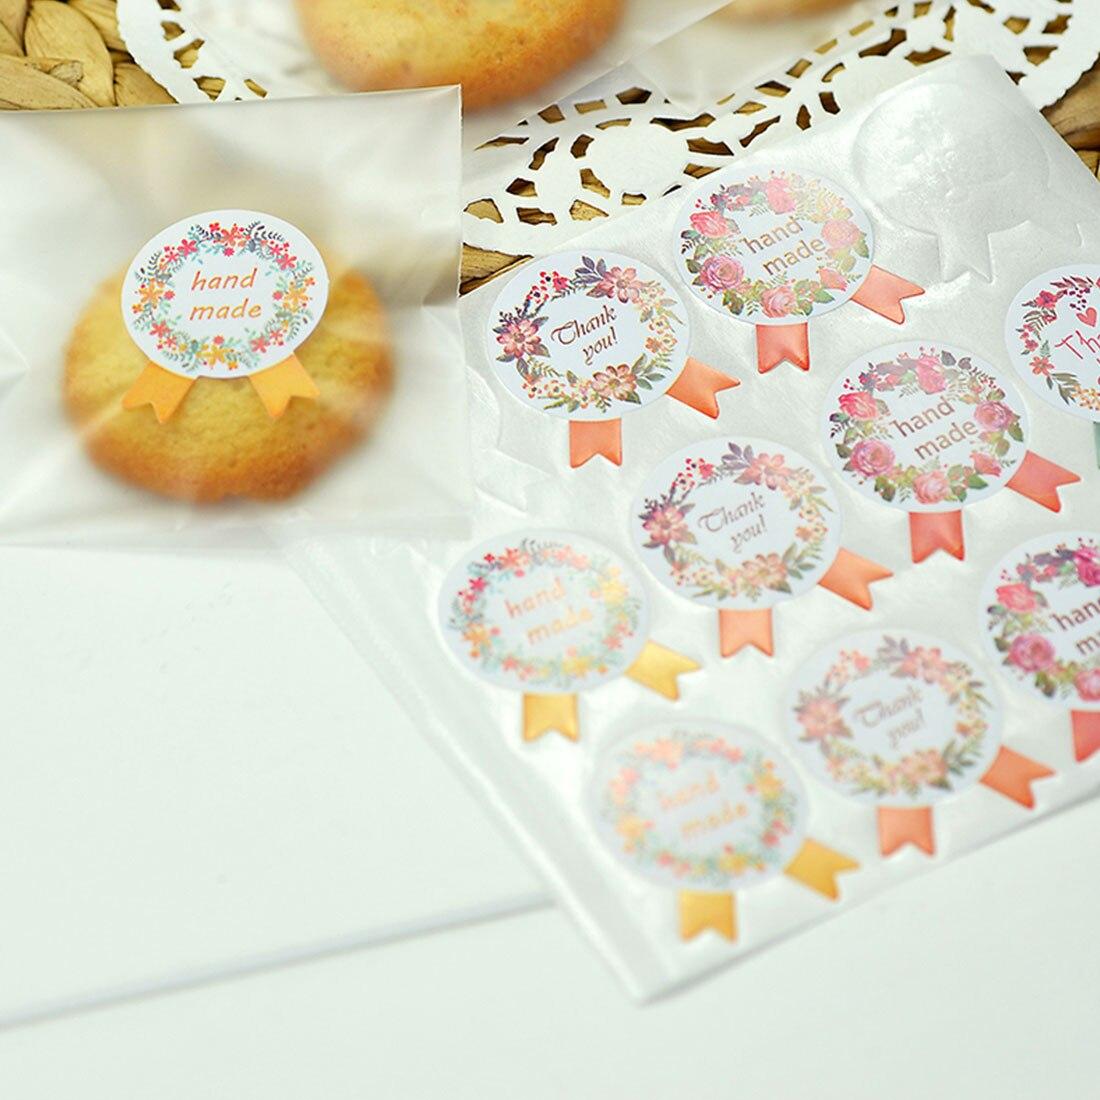 5 Sheets Handmade Sticker 60pcs/lot Vintage Stickers Kraft Label Sticker DIY Hand Made For Garland Small Bow Tie  Seal Sticker